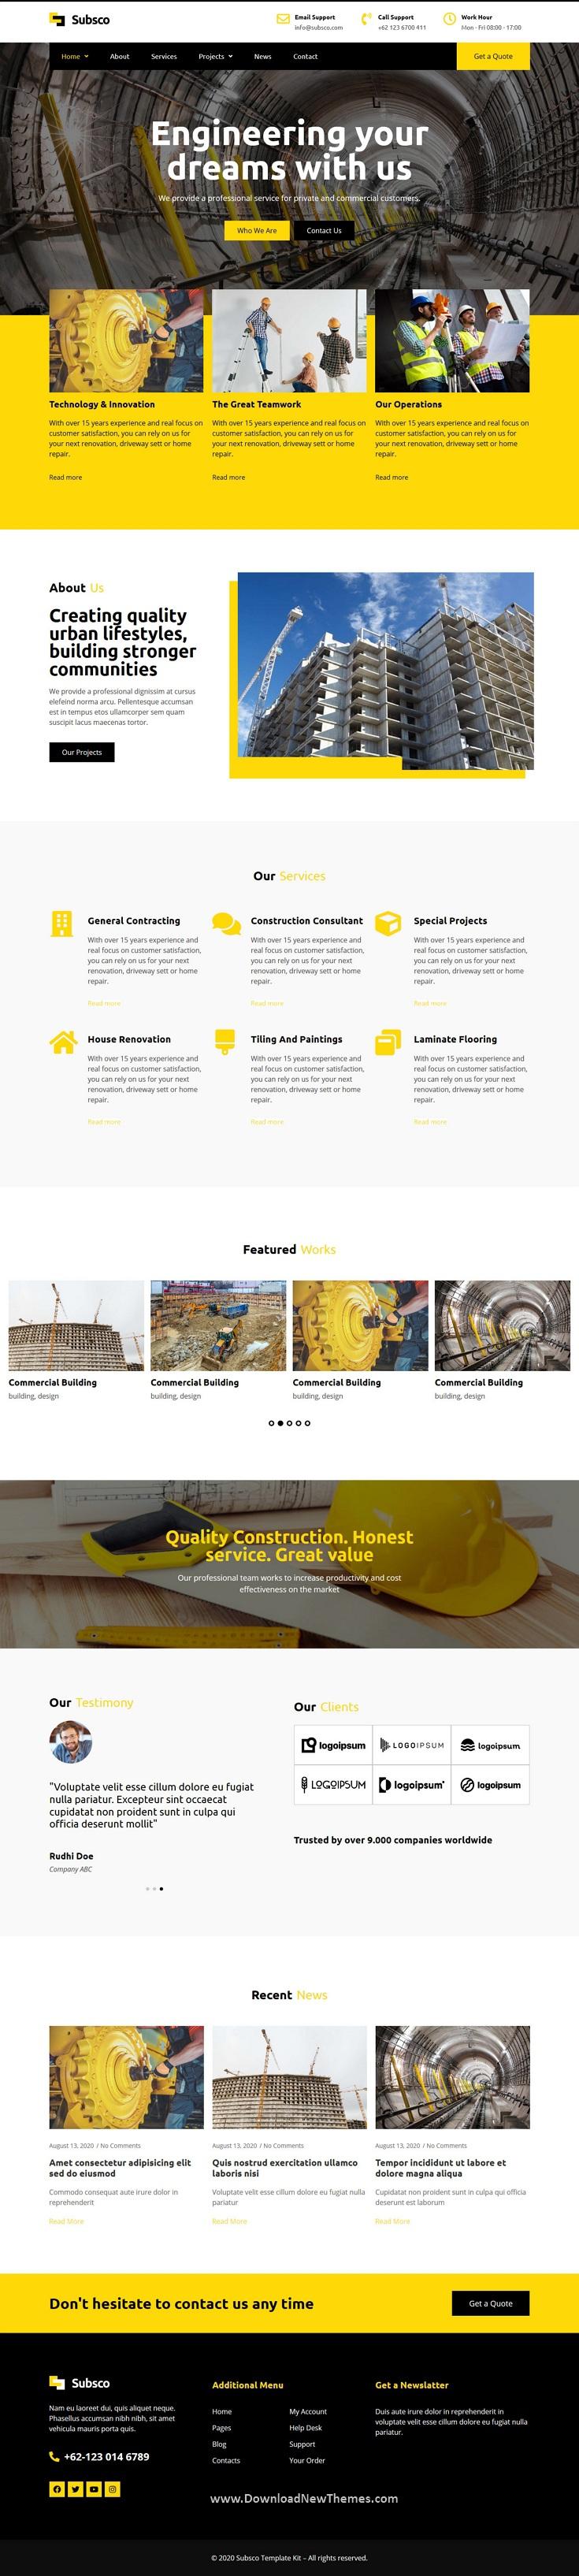 Construction Company Template Kit